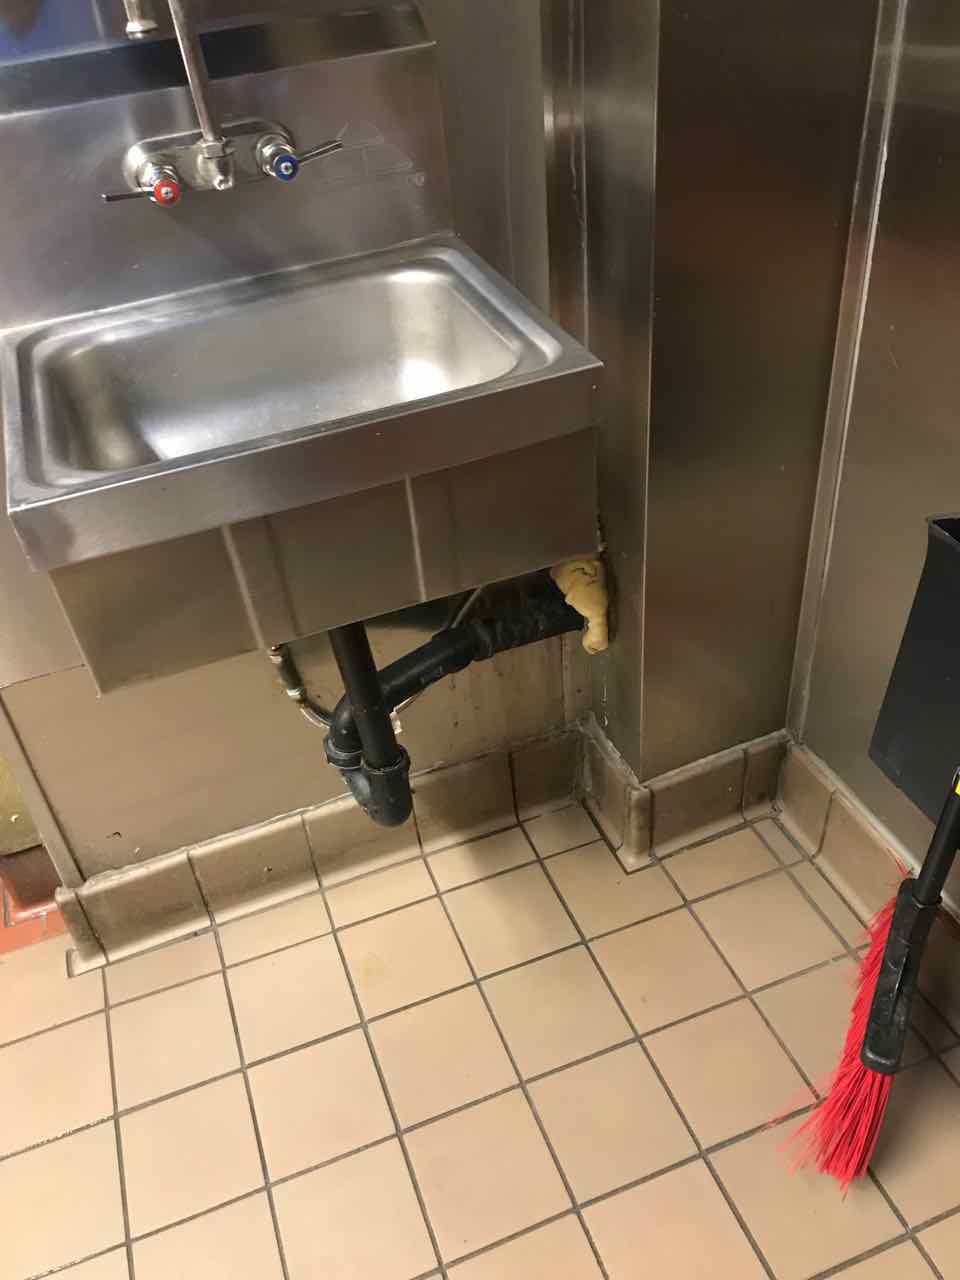 Commercial kitchen preventative and reactive maintenance for restaurant.